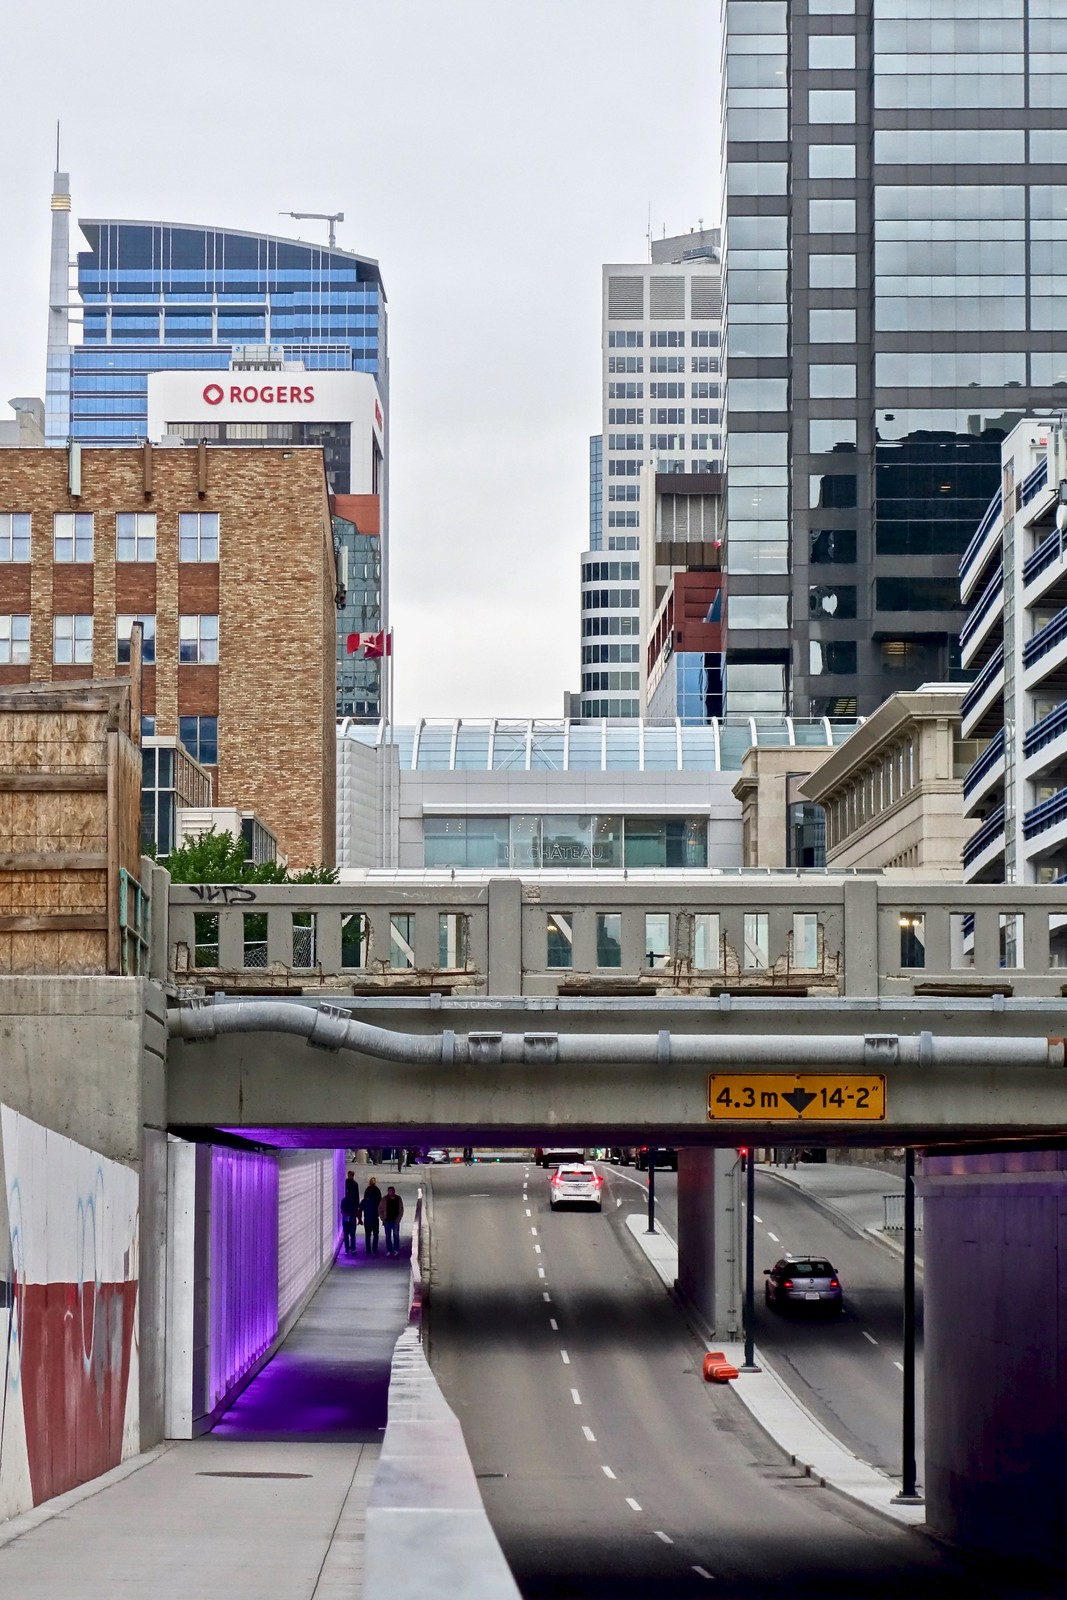 4th Street underpass